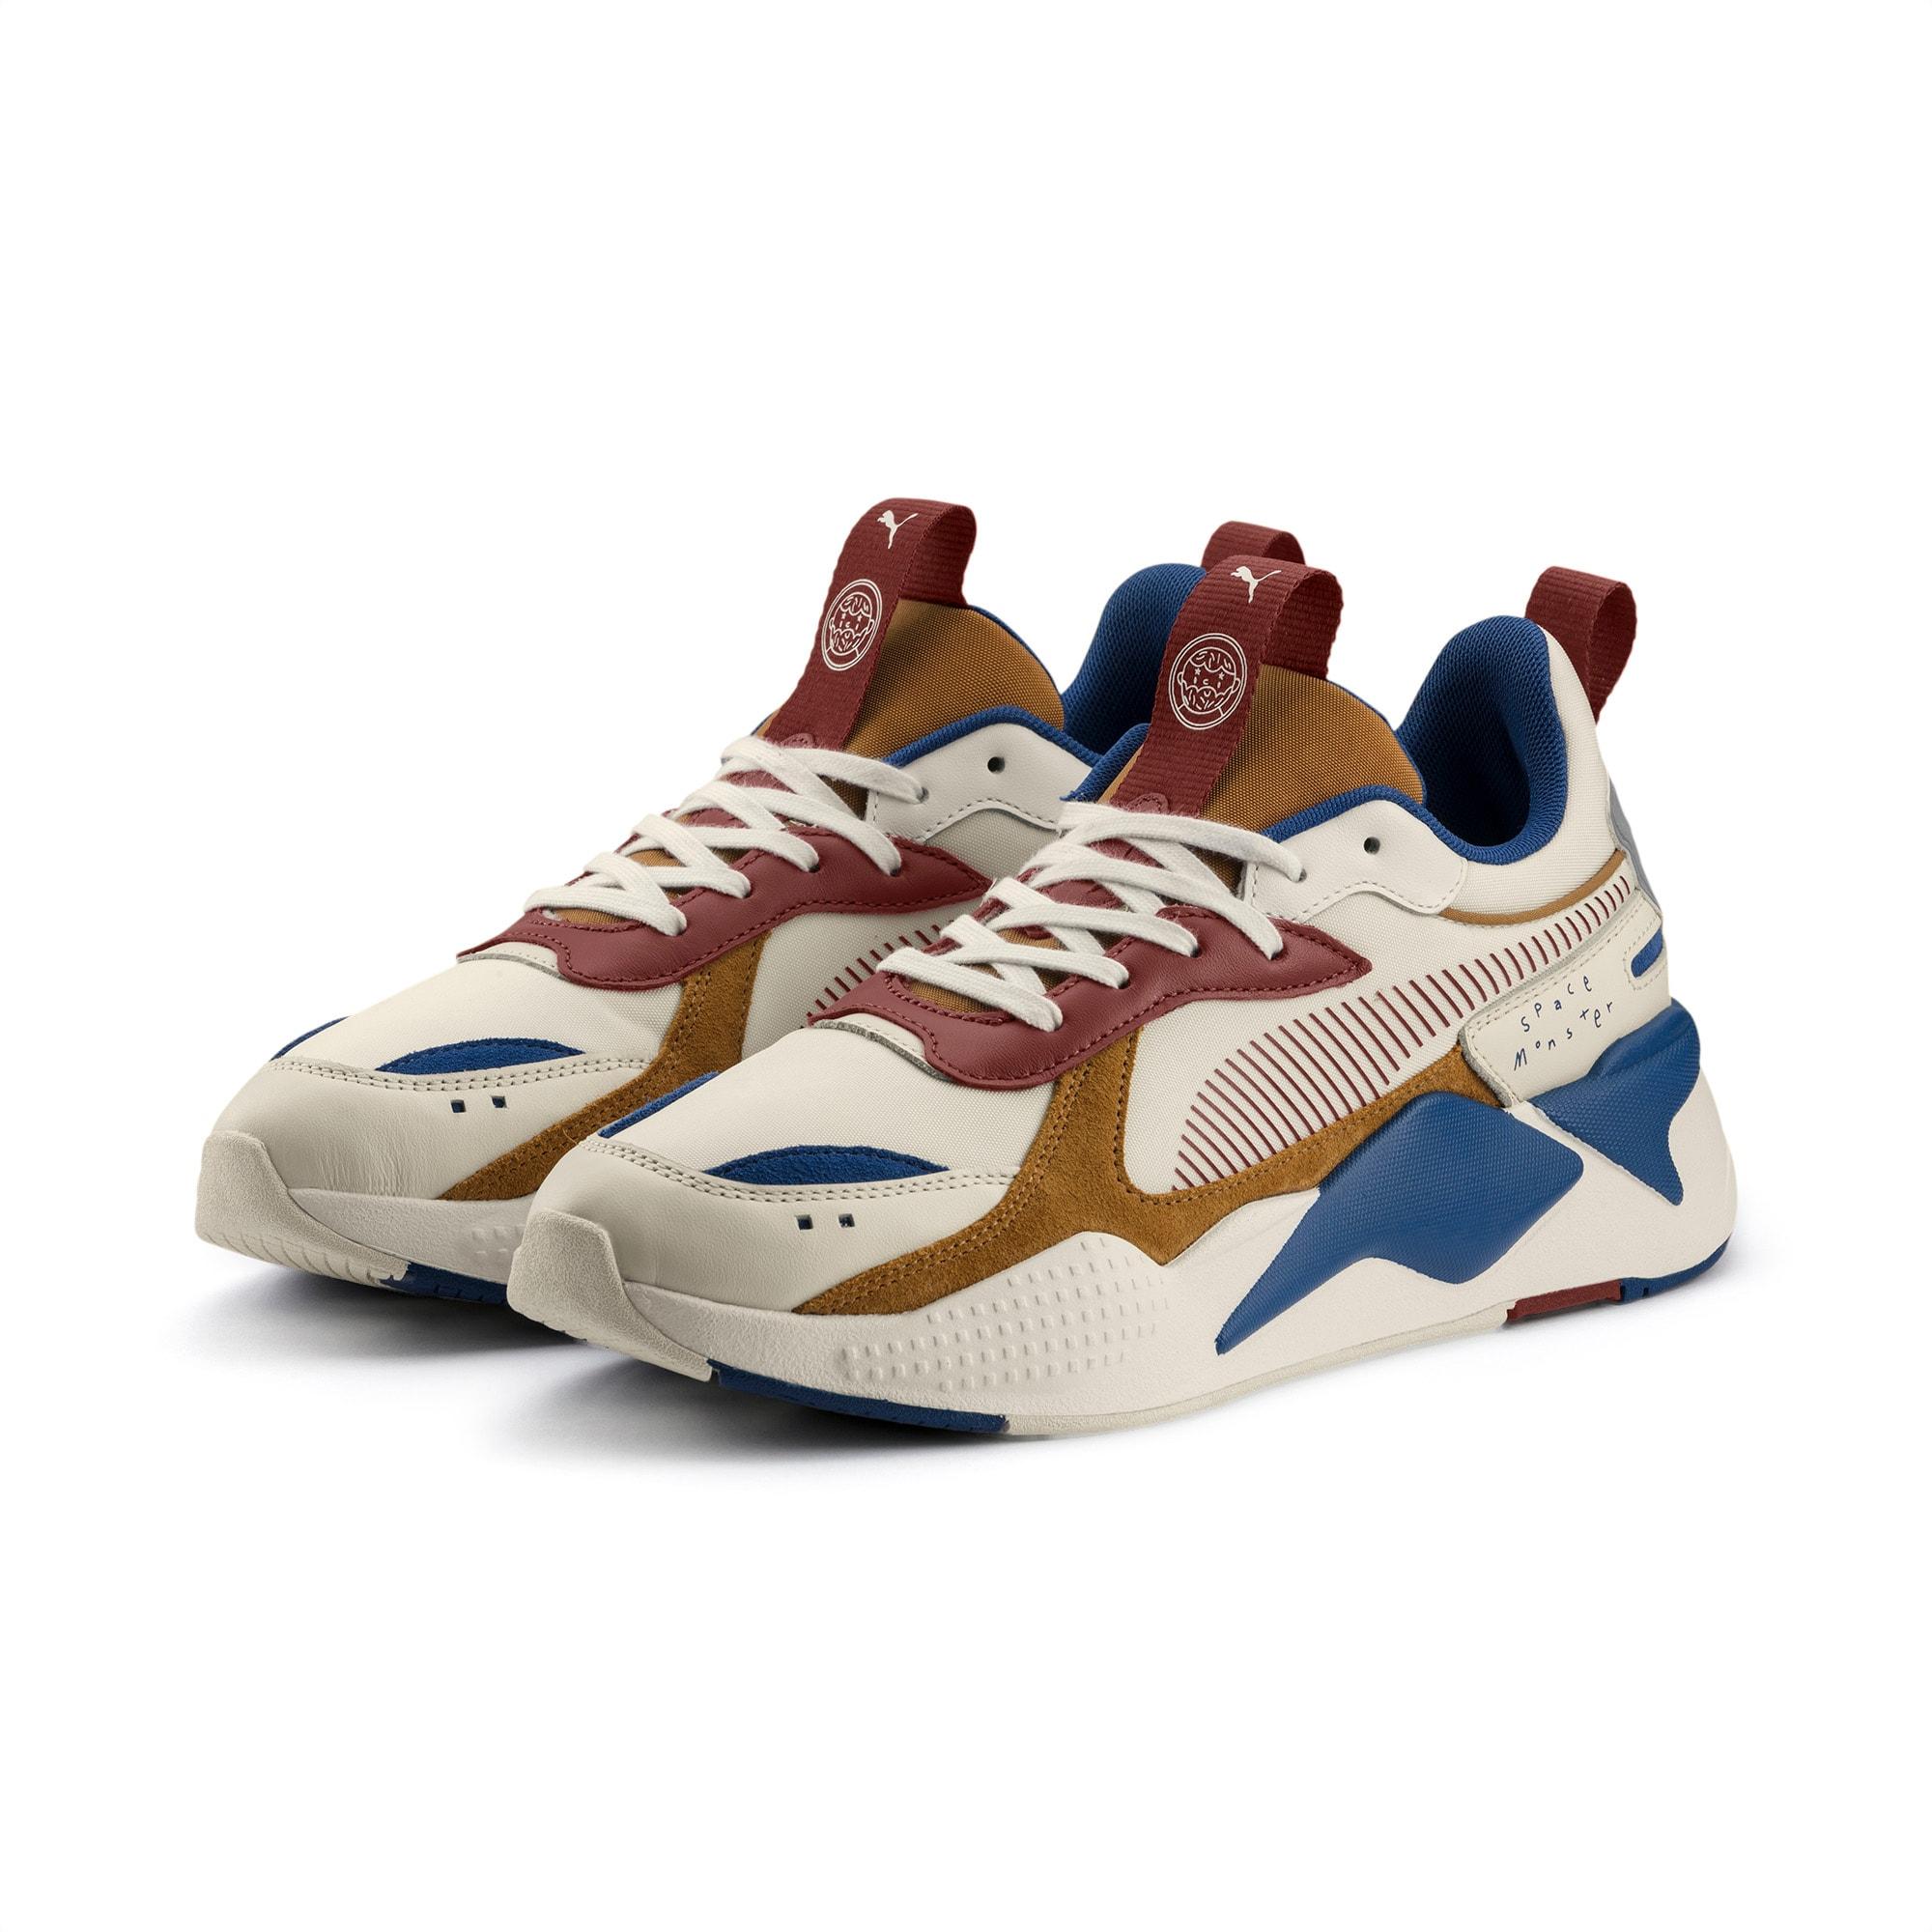 PUMA x TYAKASHA RS-X Men's Sneakers